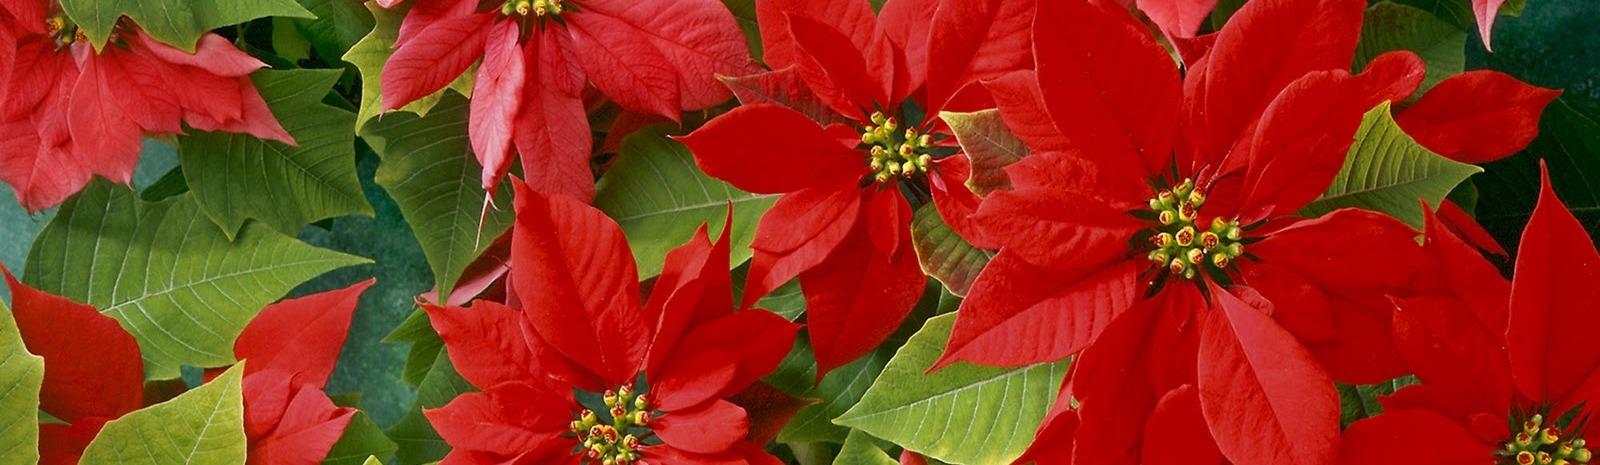 flores-de-pascua-decoracion-navidad-zaragoza